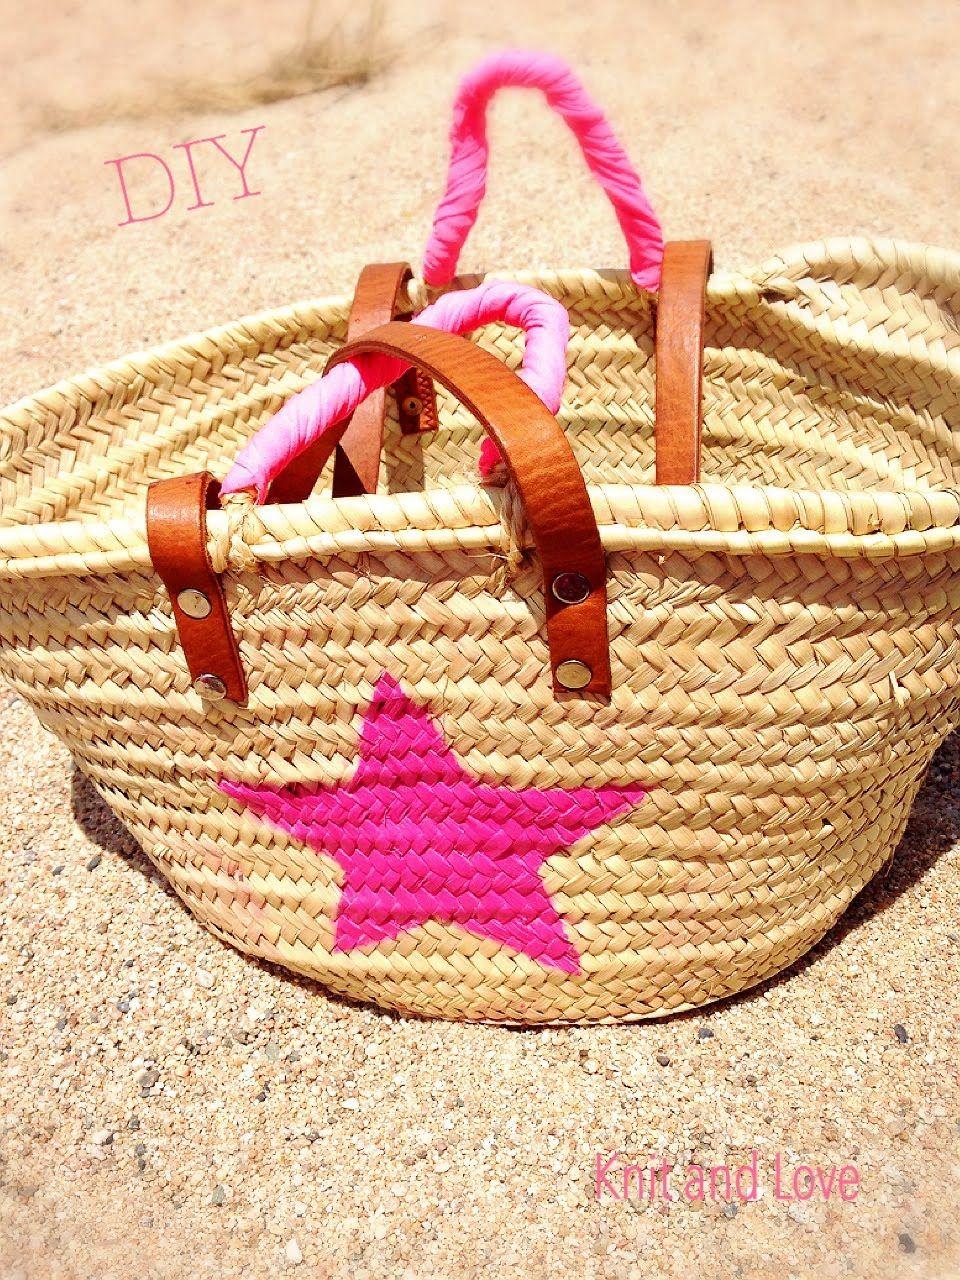 Paso a paso c mo decorar una cesta de mimbre cestas y - Como forrar una cesta de mimbre ...